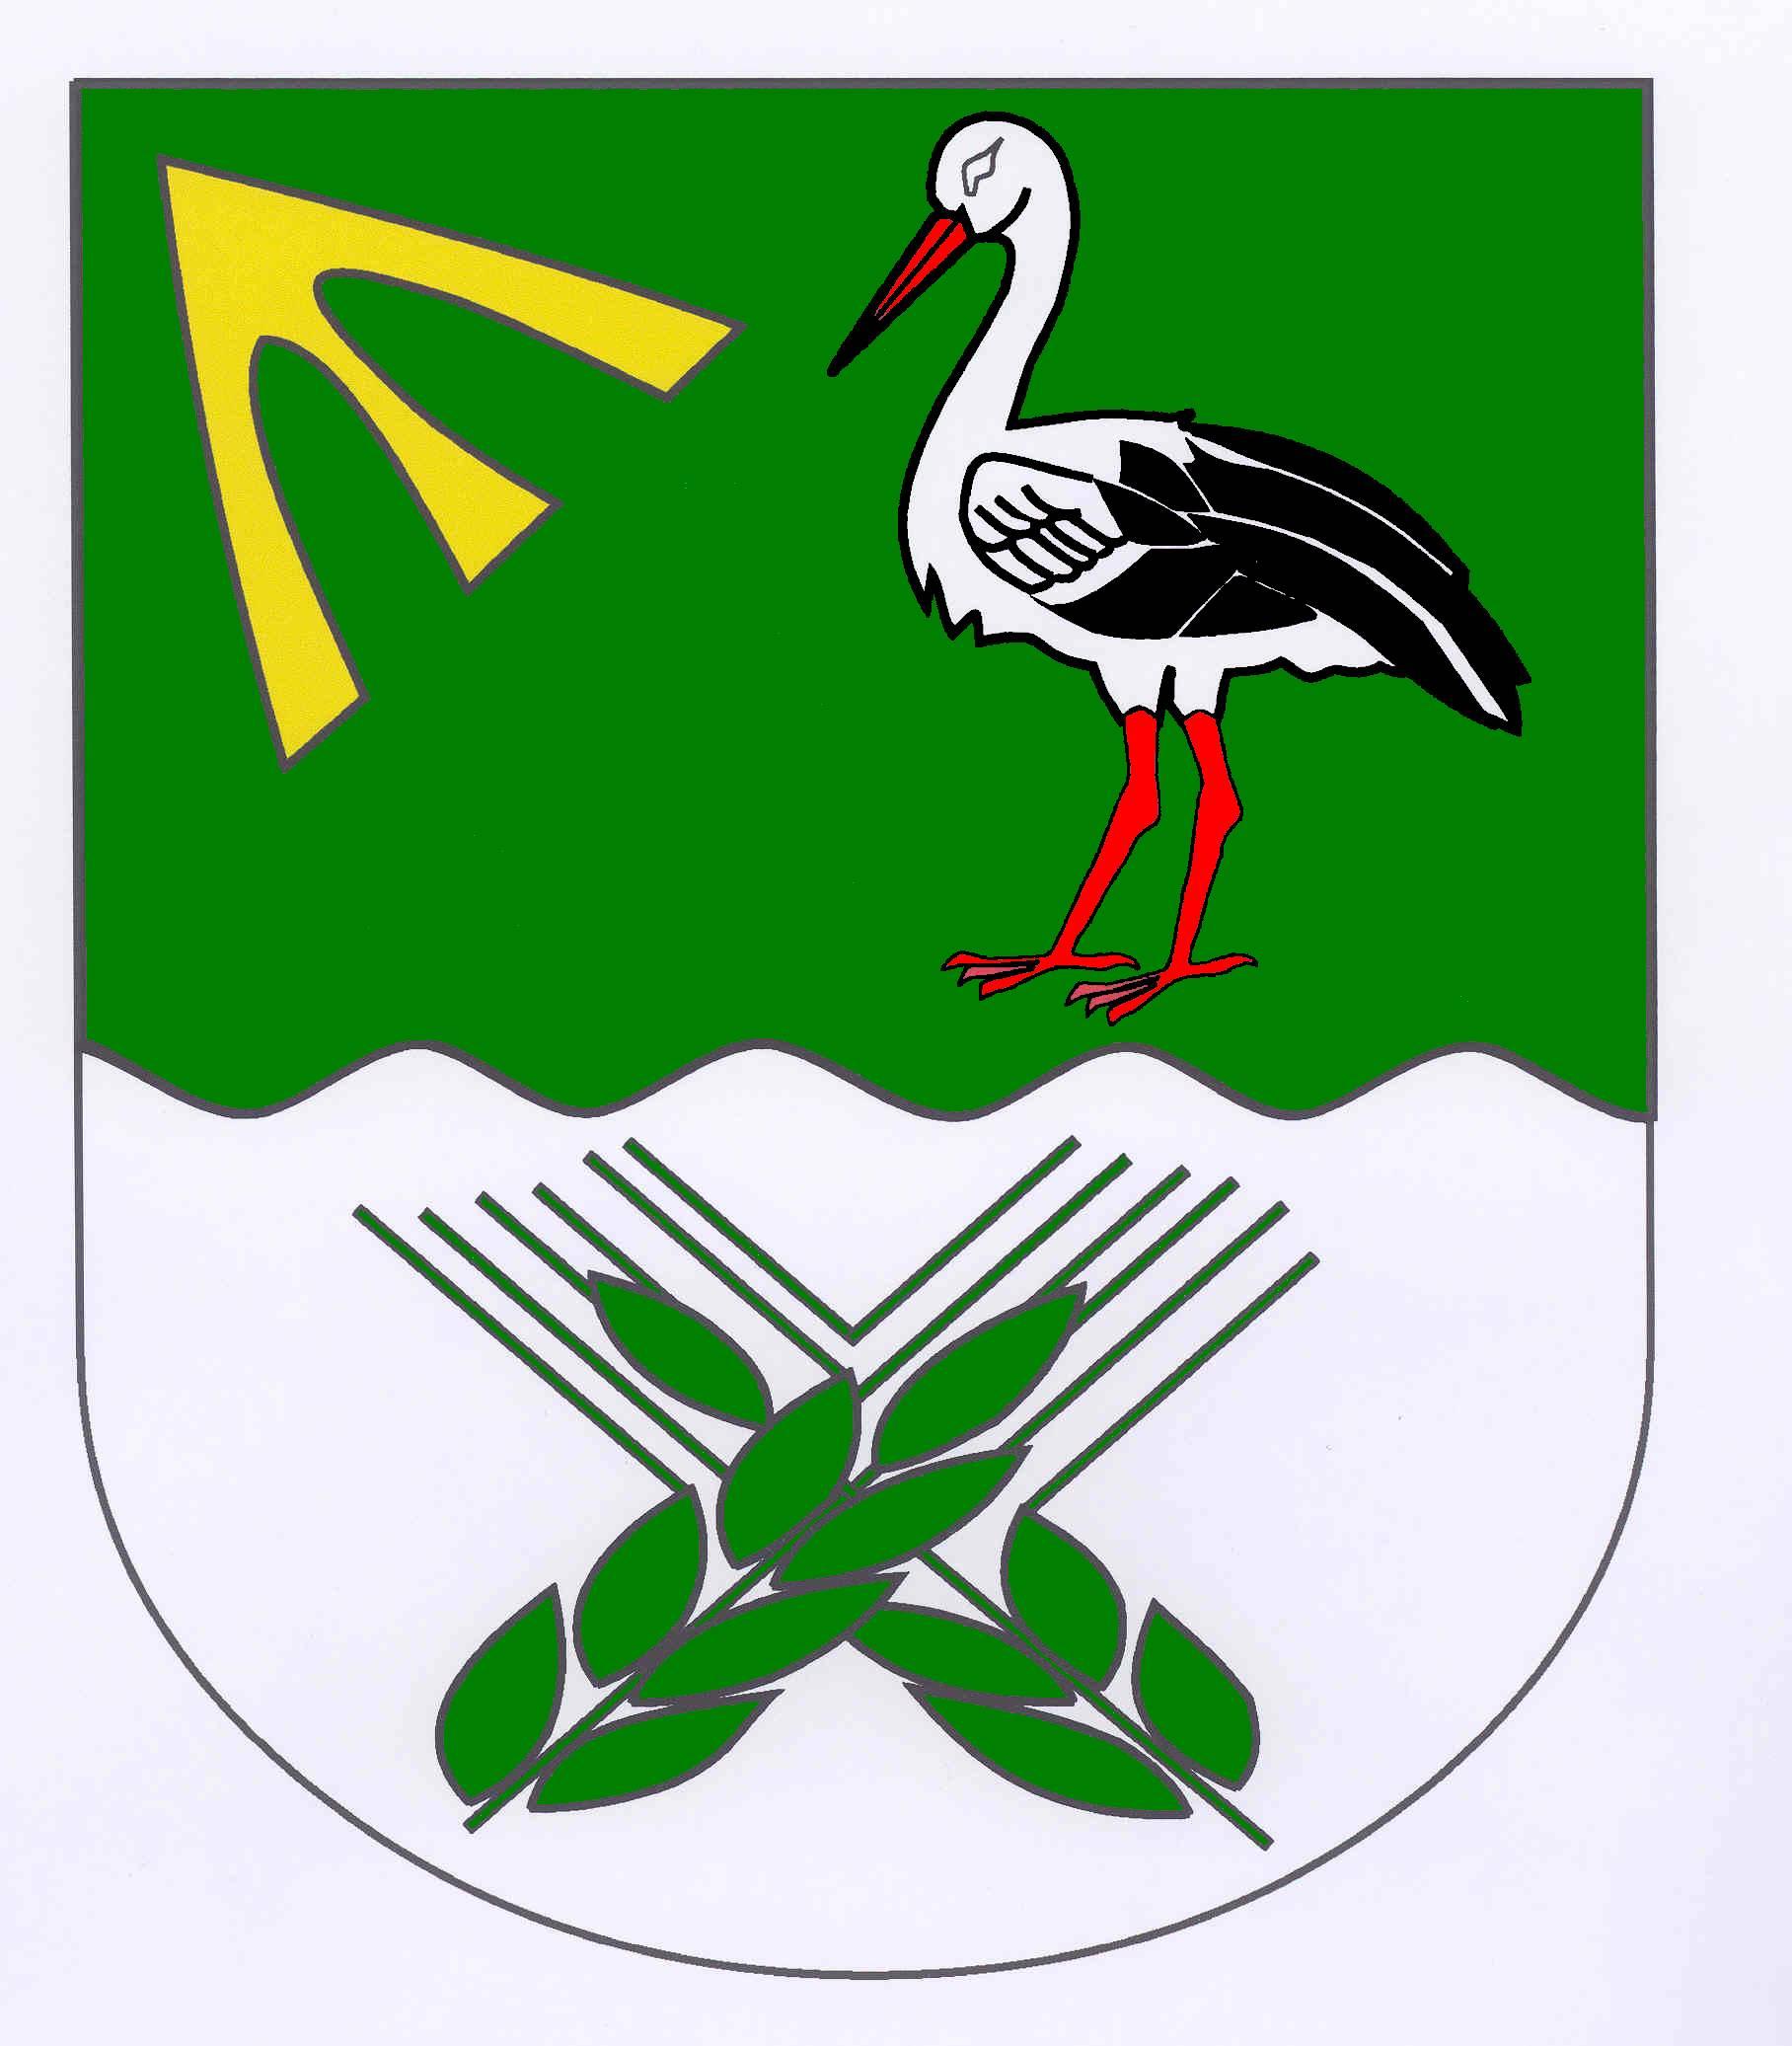 Wappen GemeindeKlempau, Kreis Herzogtum Lauenburg